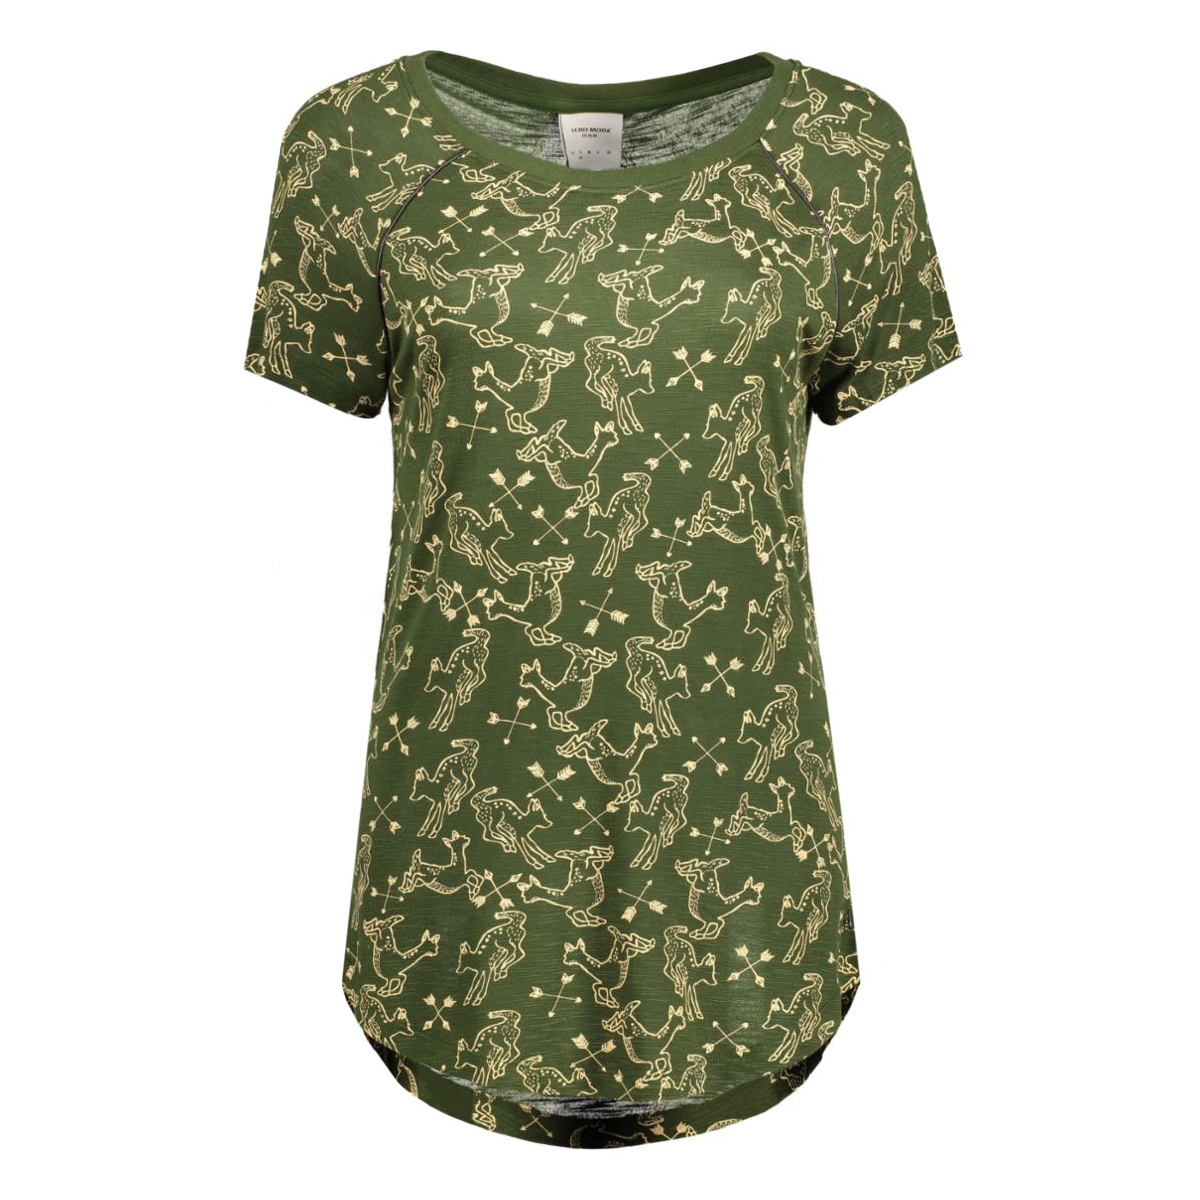 vmmilina hunter ss top box dnm jrs 10164695 vero moda t-shirt kombu green/hunter